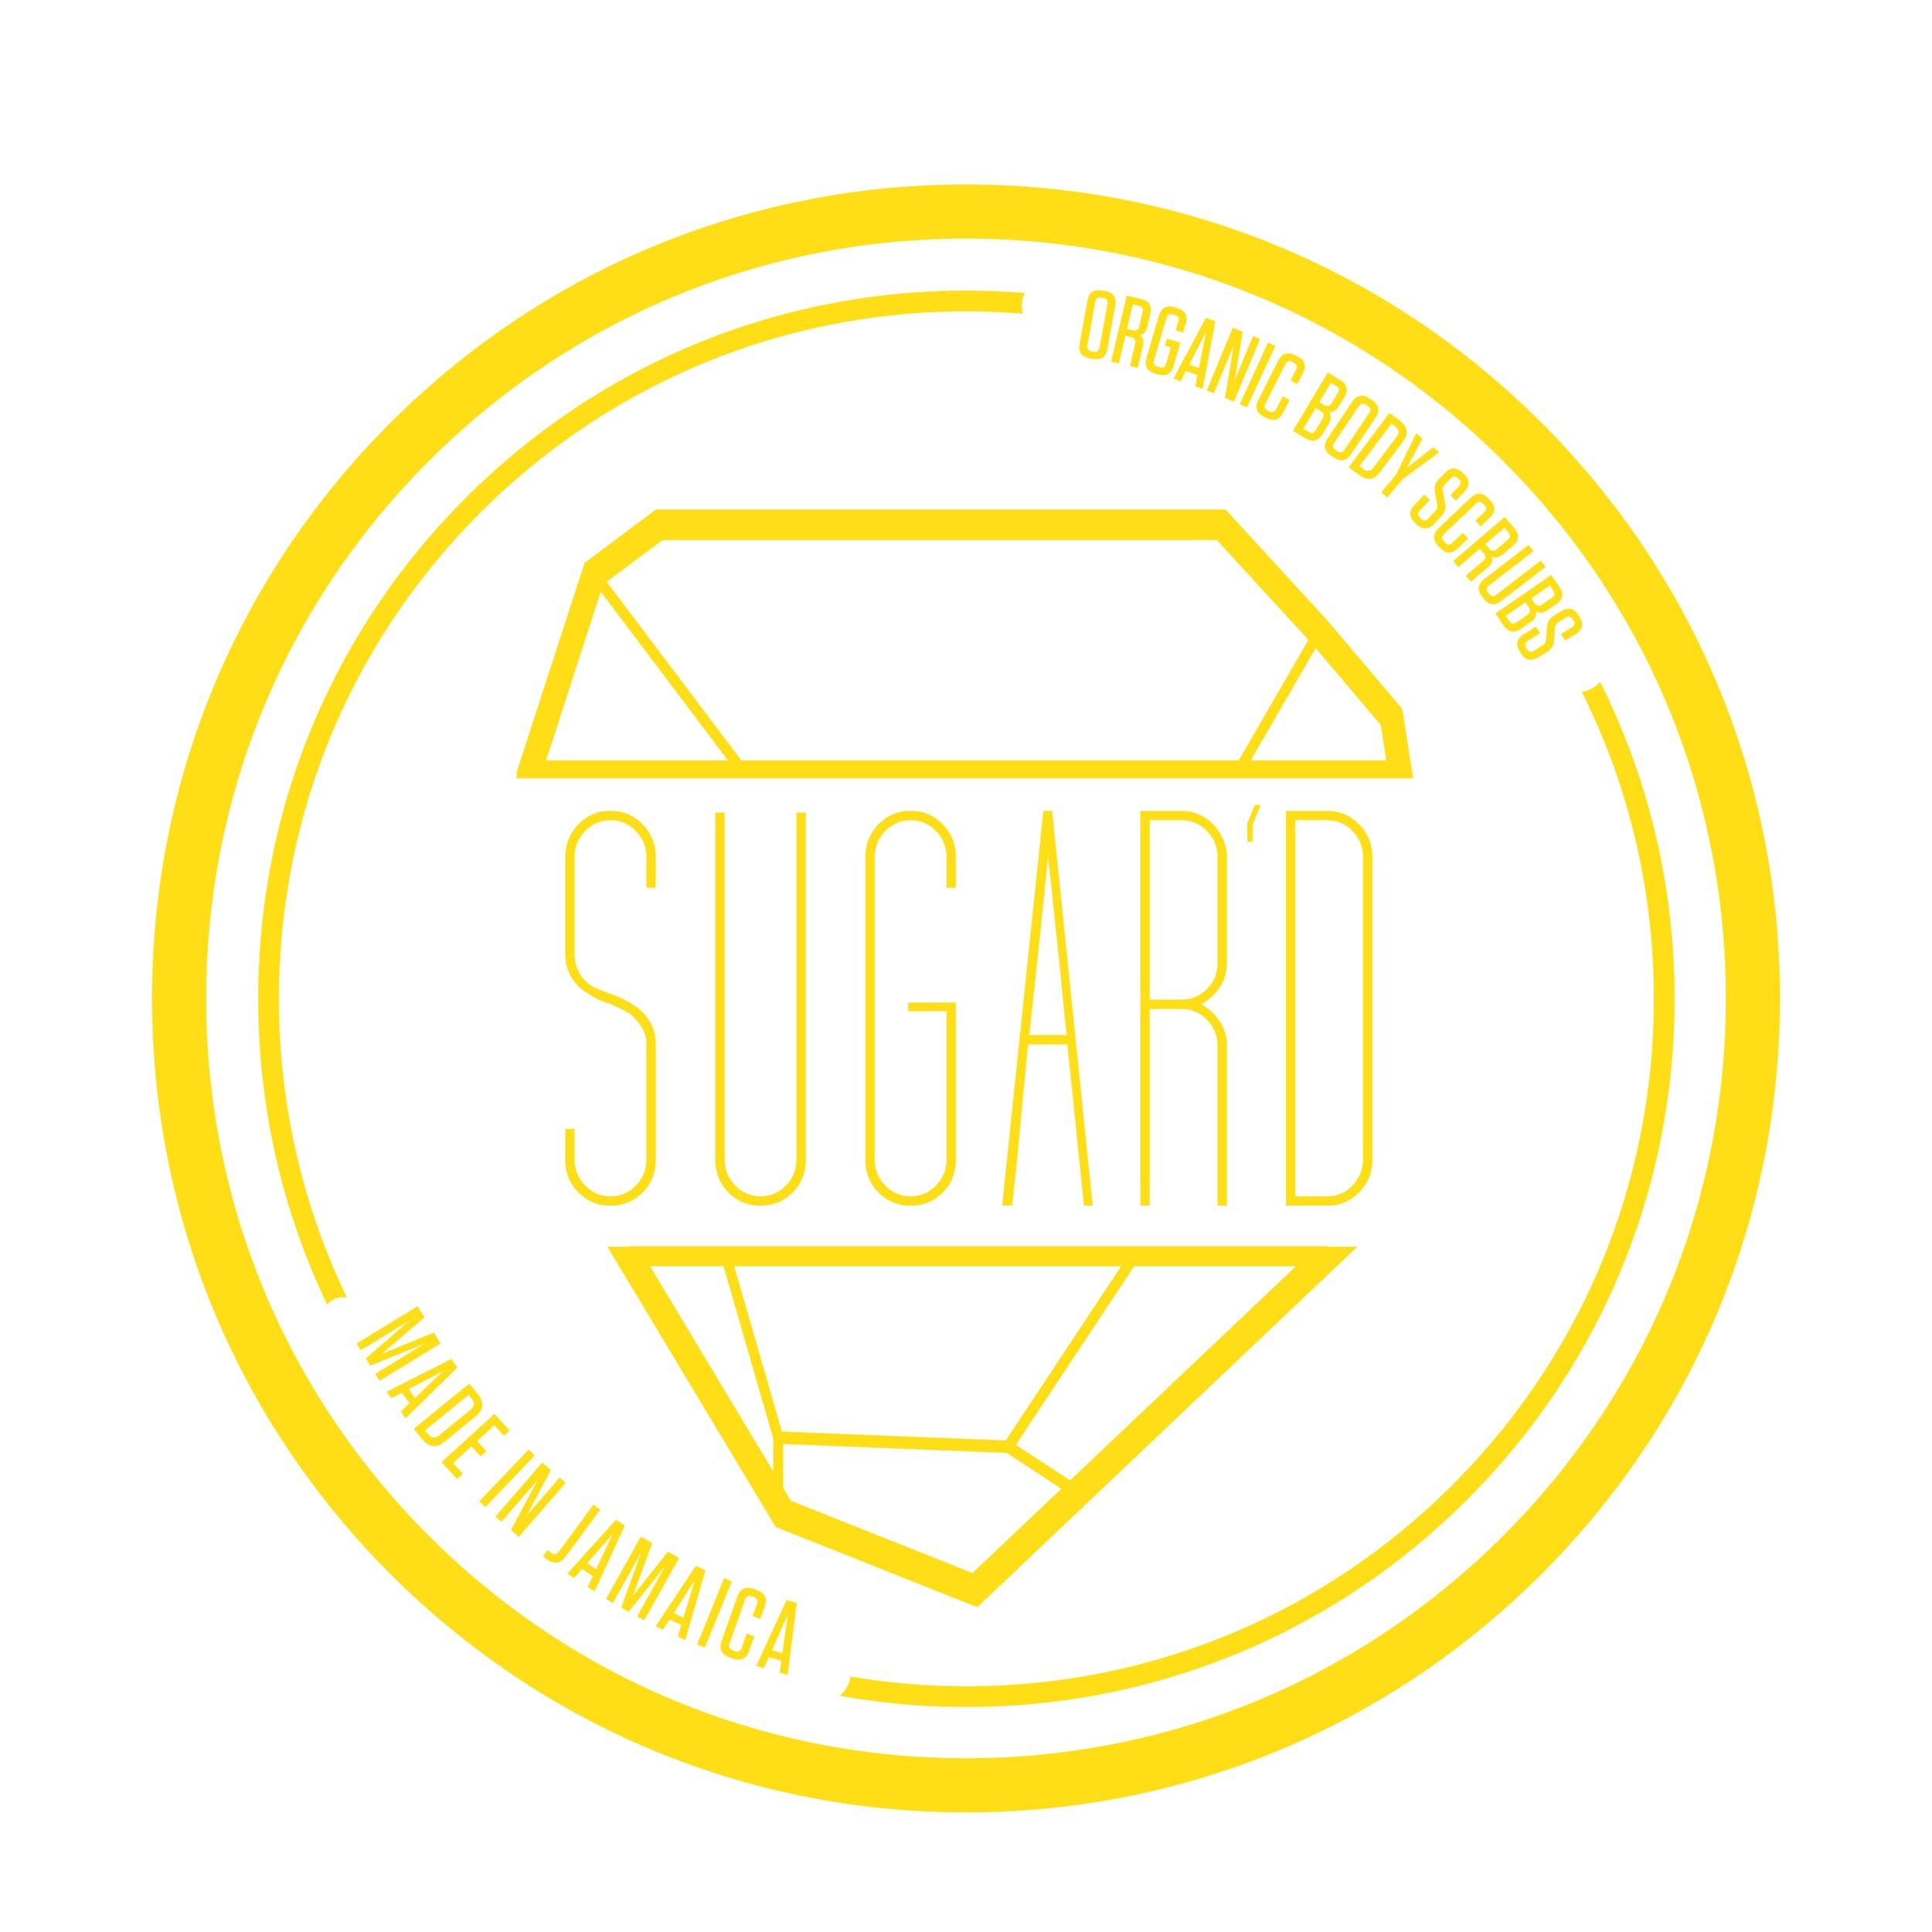 Sugard v2-03.jpg